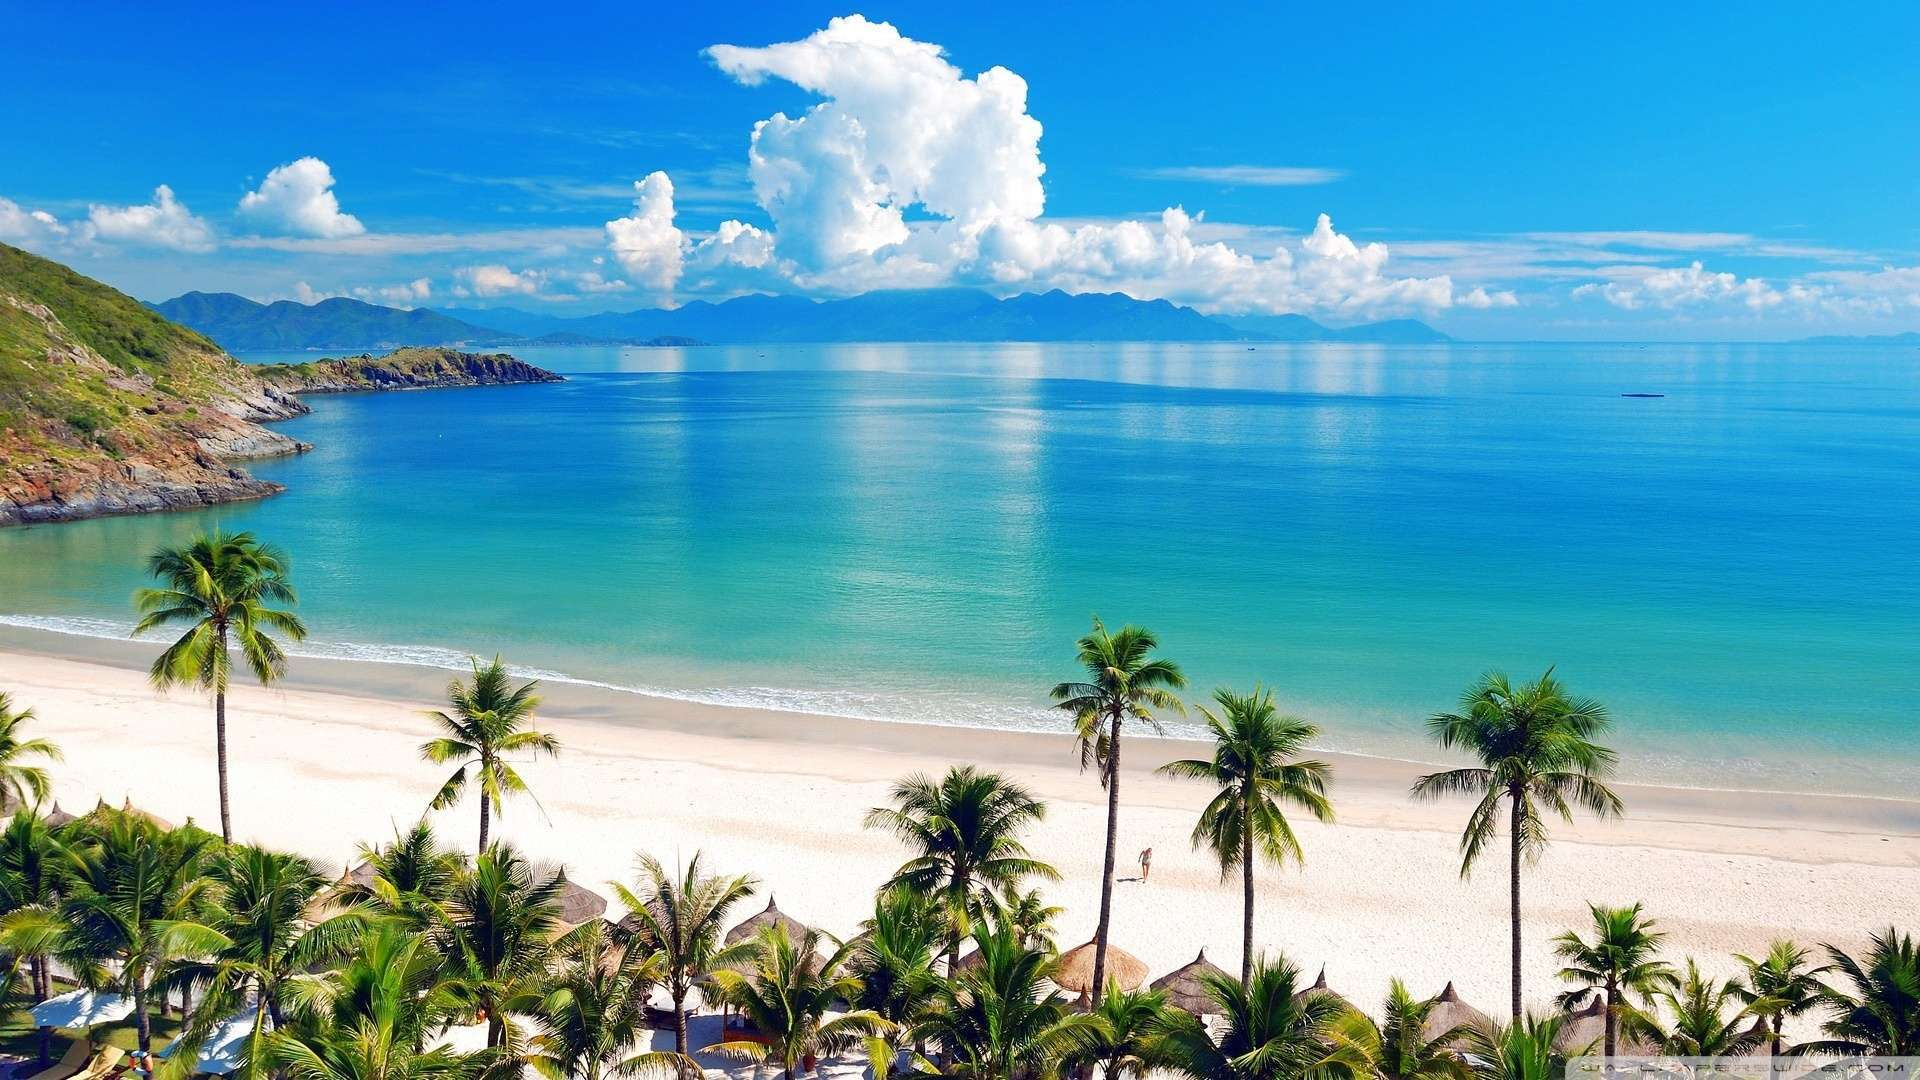 Wallpaper Sea Beach Palm Wallpaper 1080p HD Upload at February 2 1920x1080